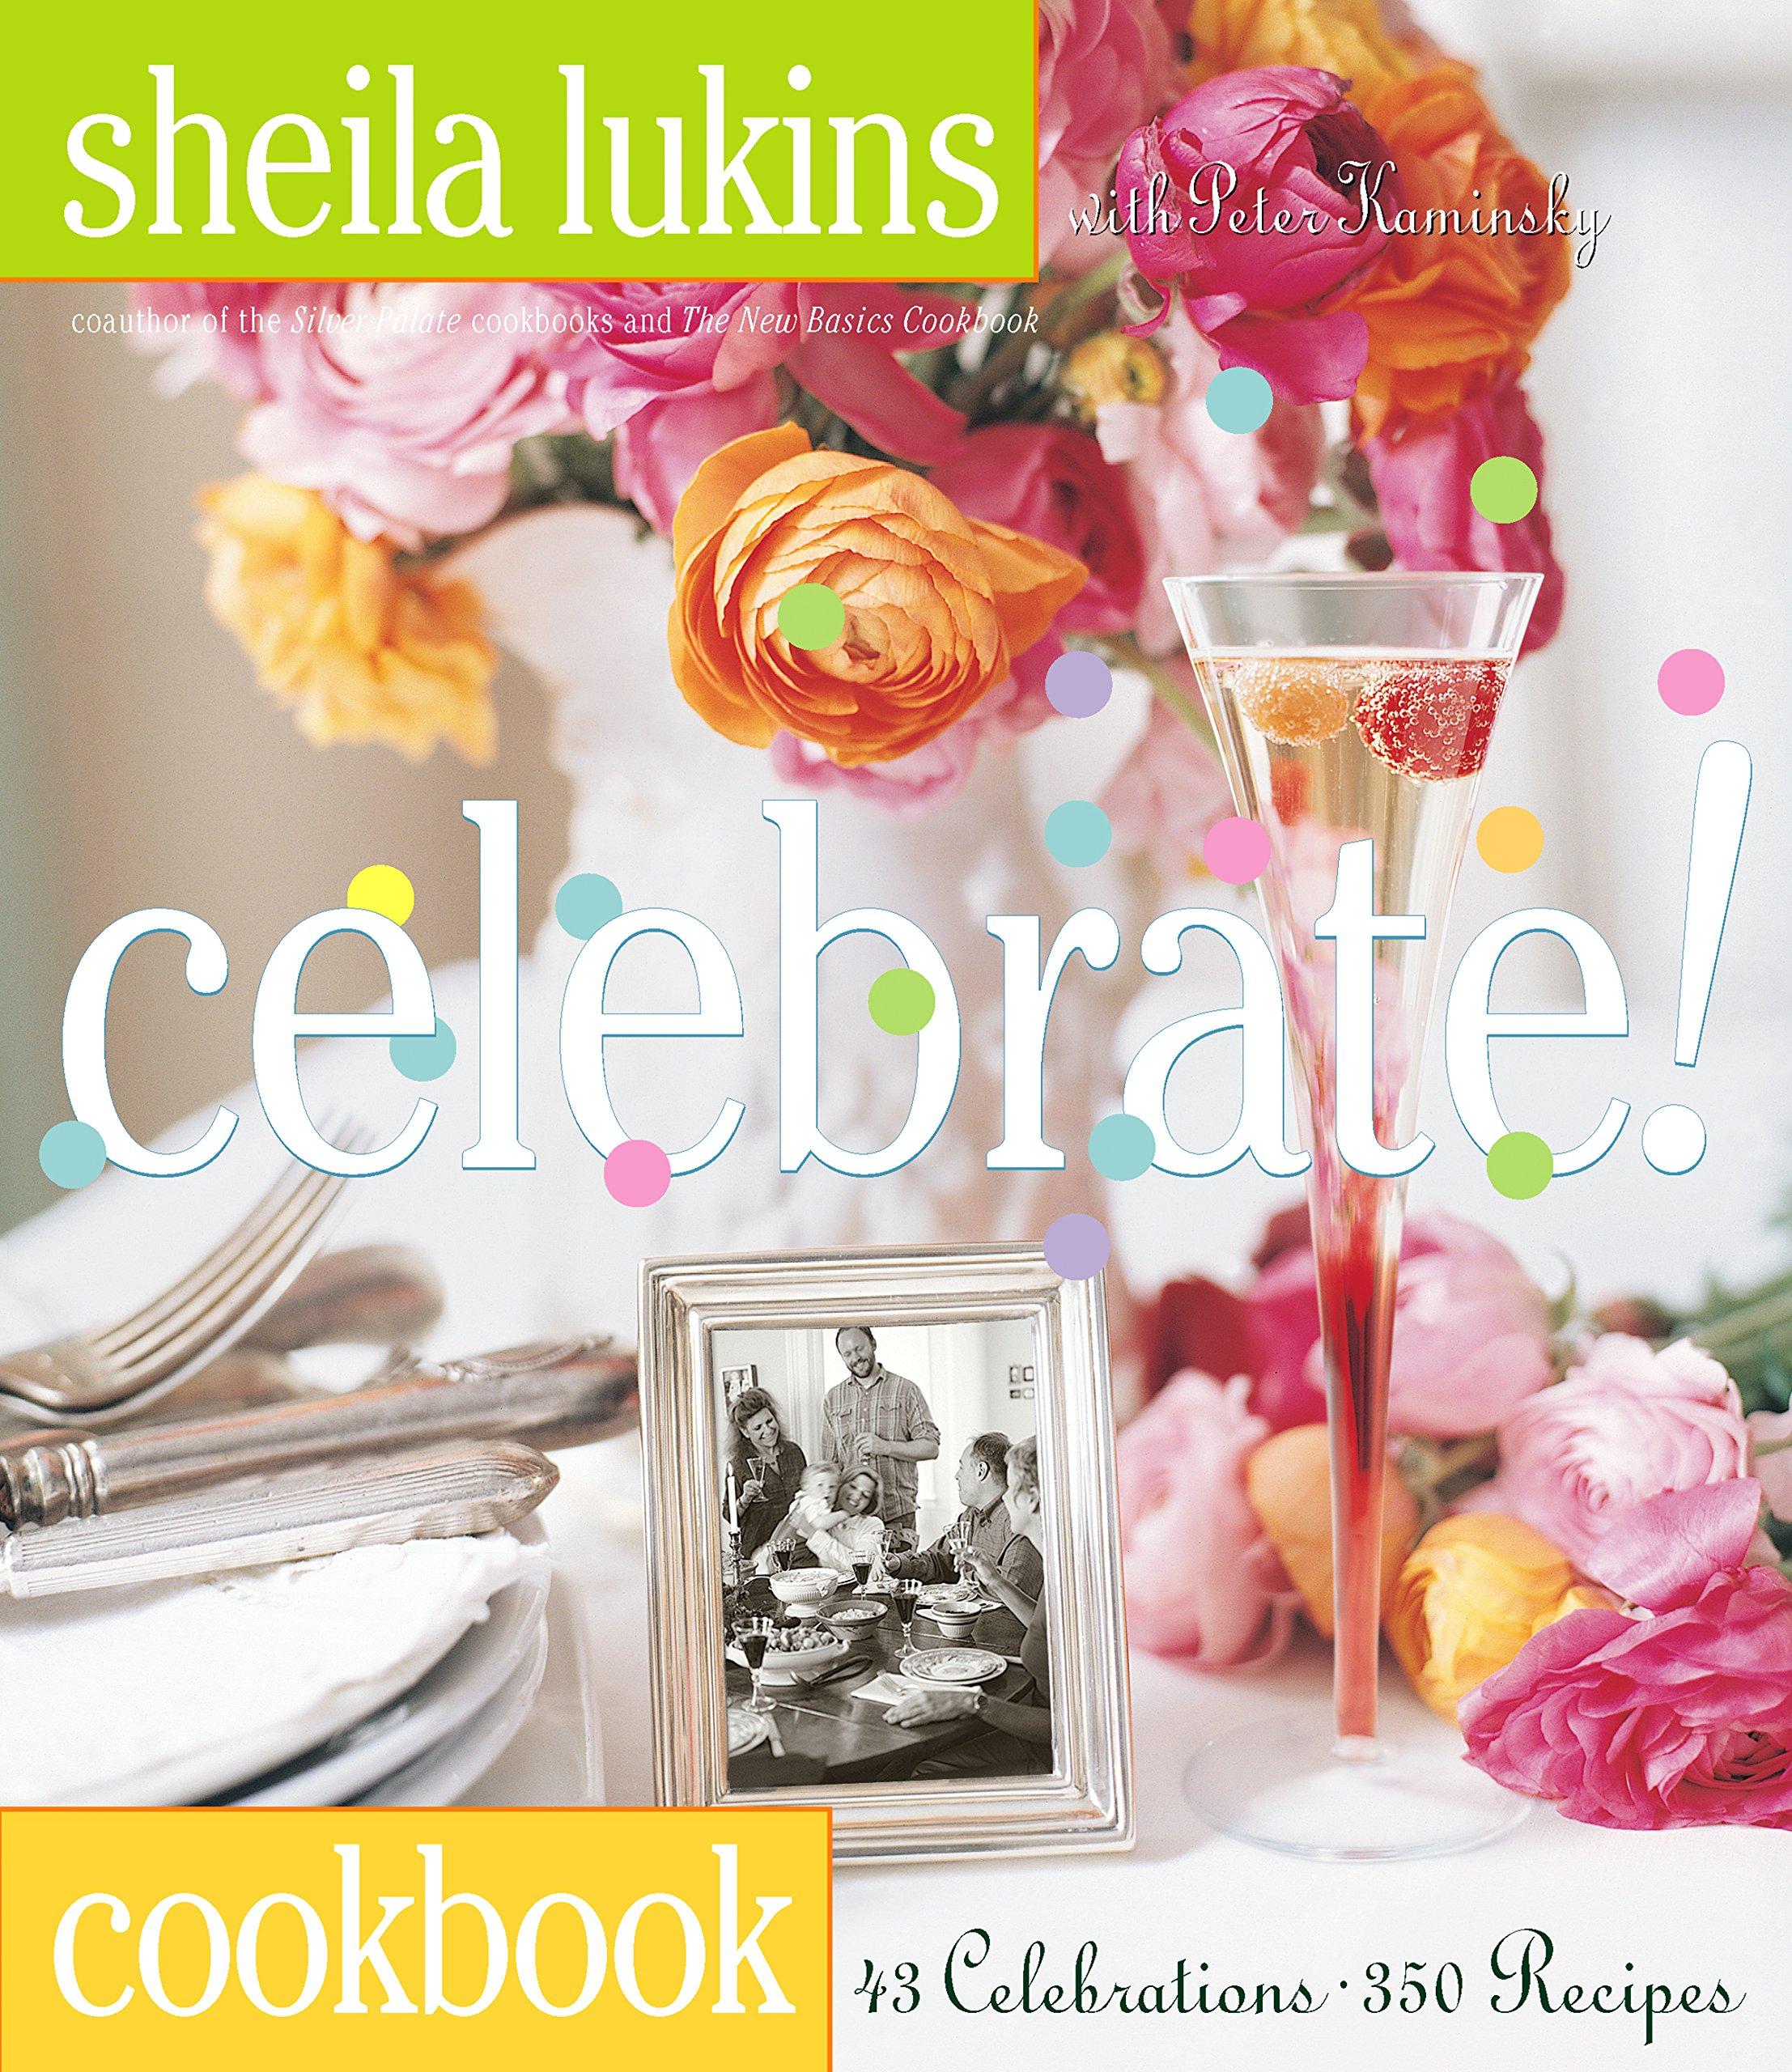 sheila lukins 9780761123729 amazoncom books - Sheila Lukins Recipes